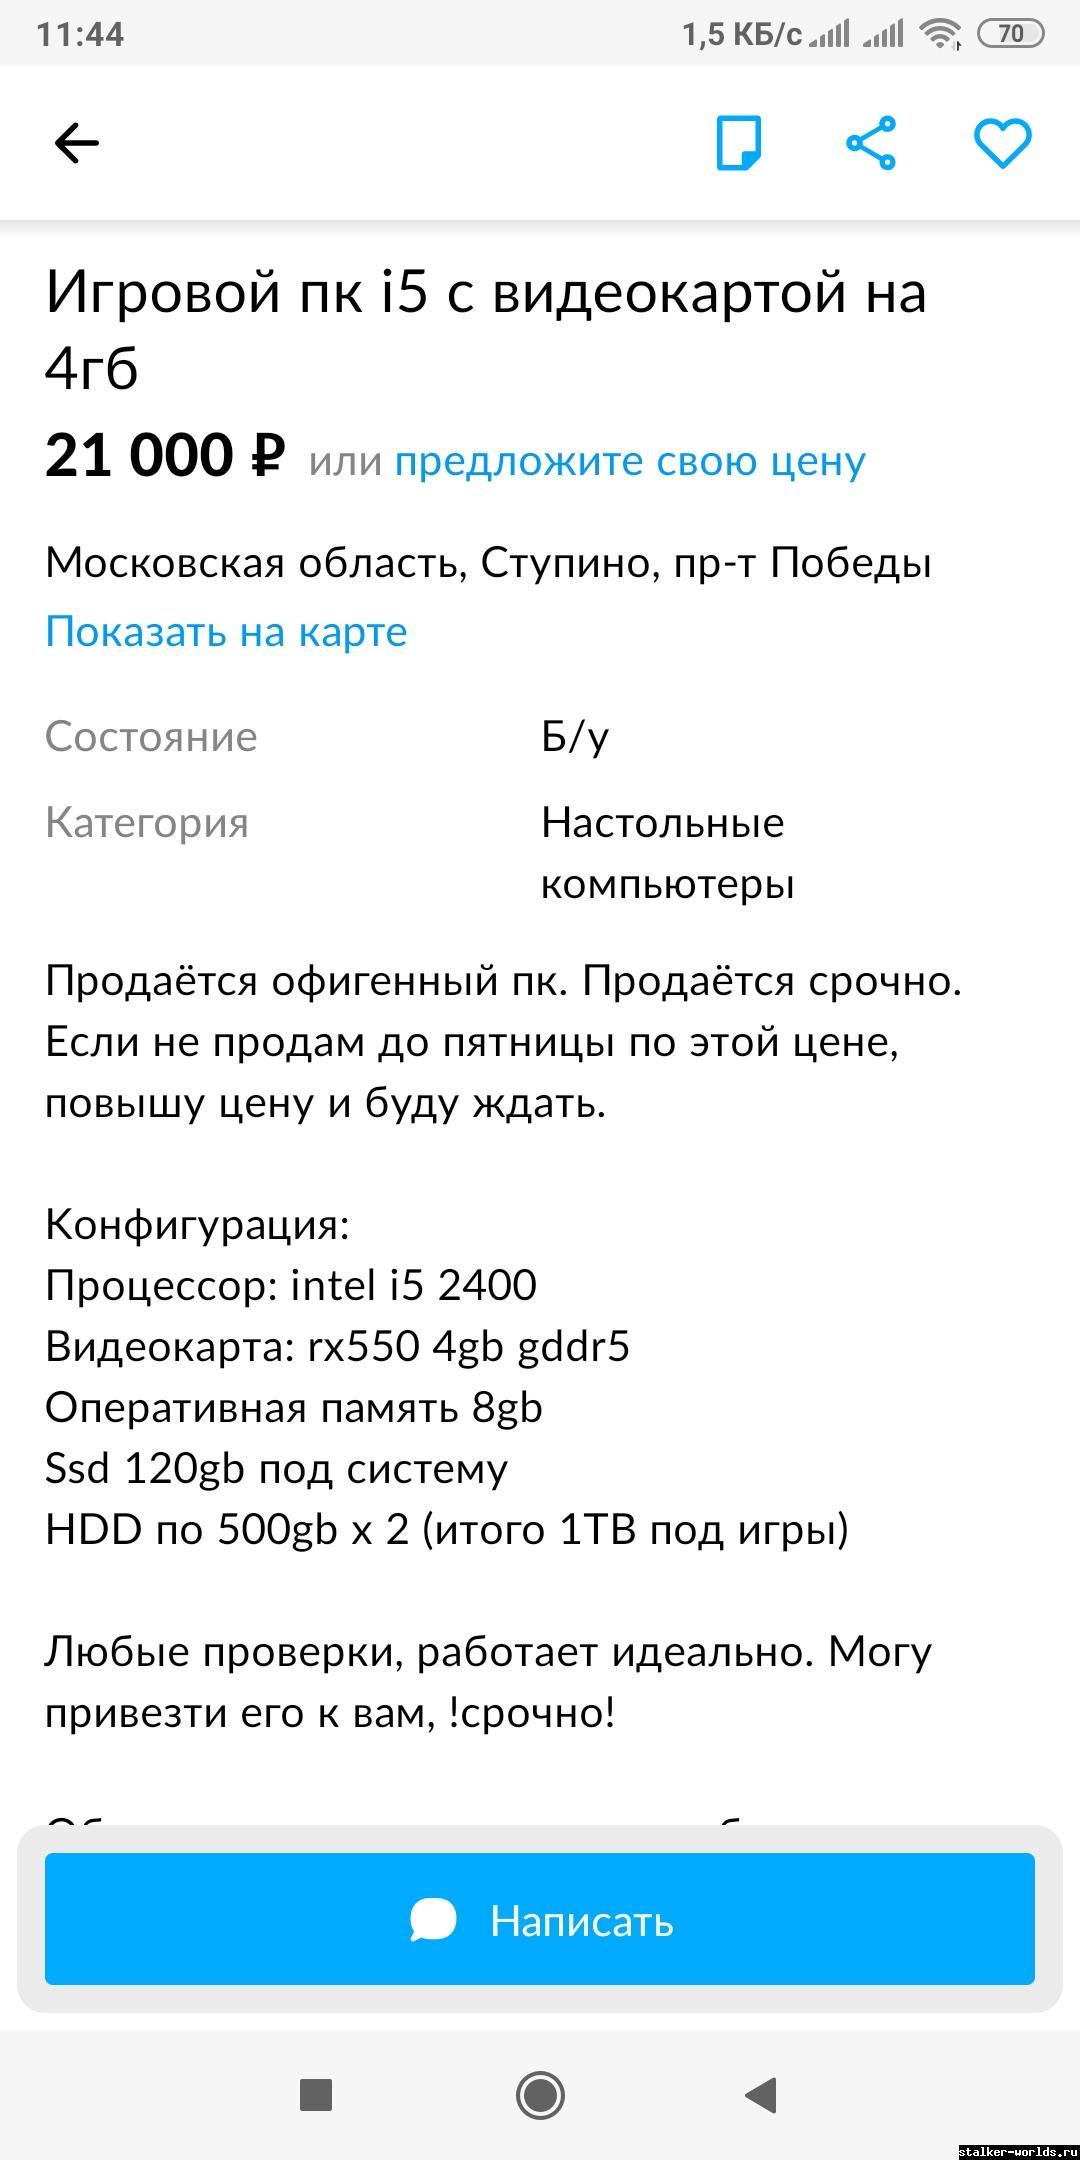 sw_1632300326__screenshot_2021-09-22-11-